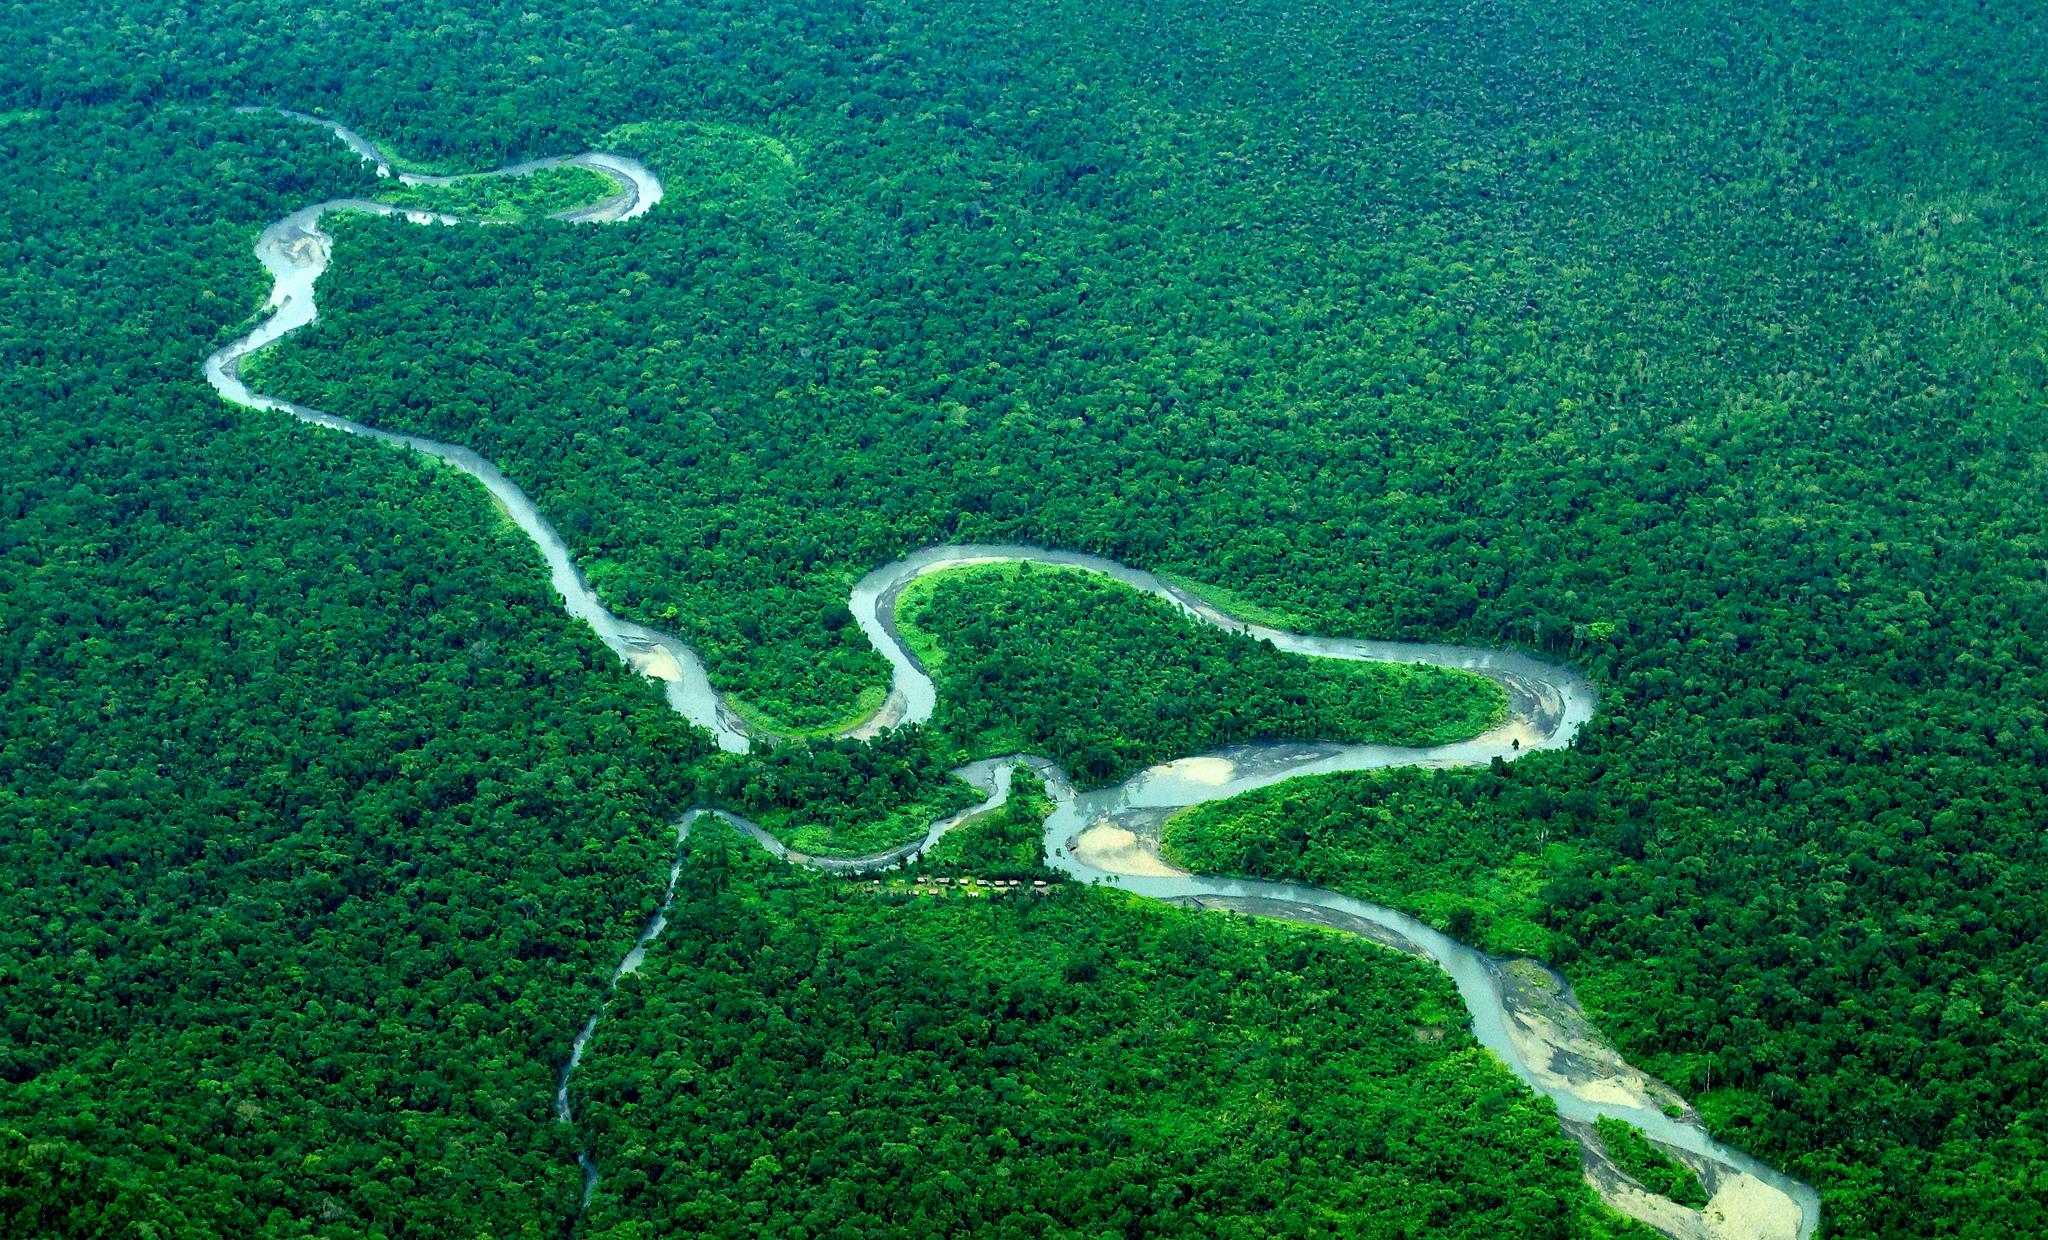 River winding through the rainforest